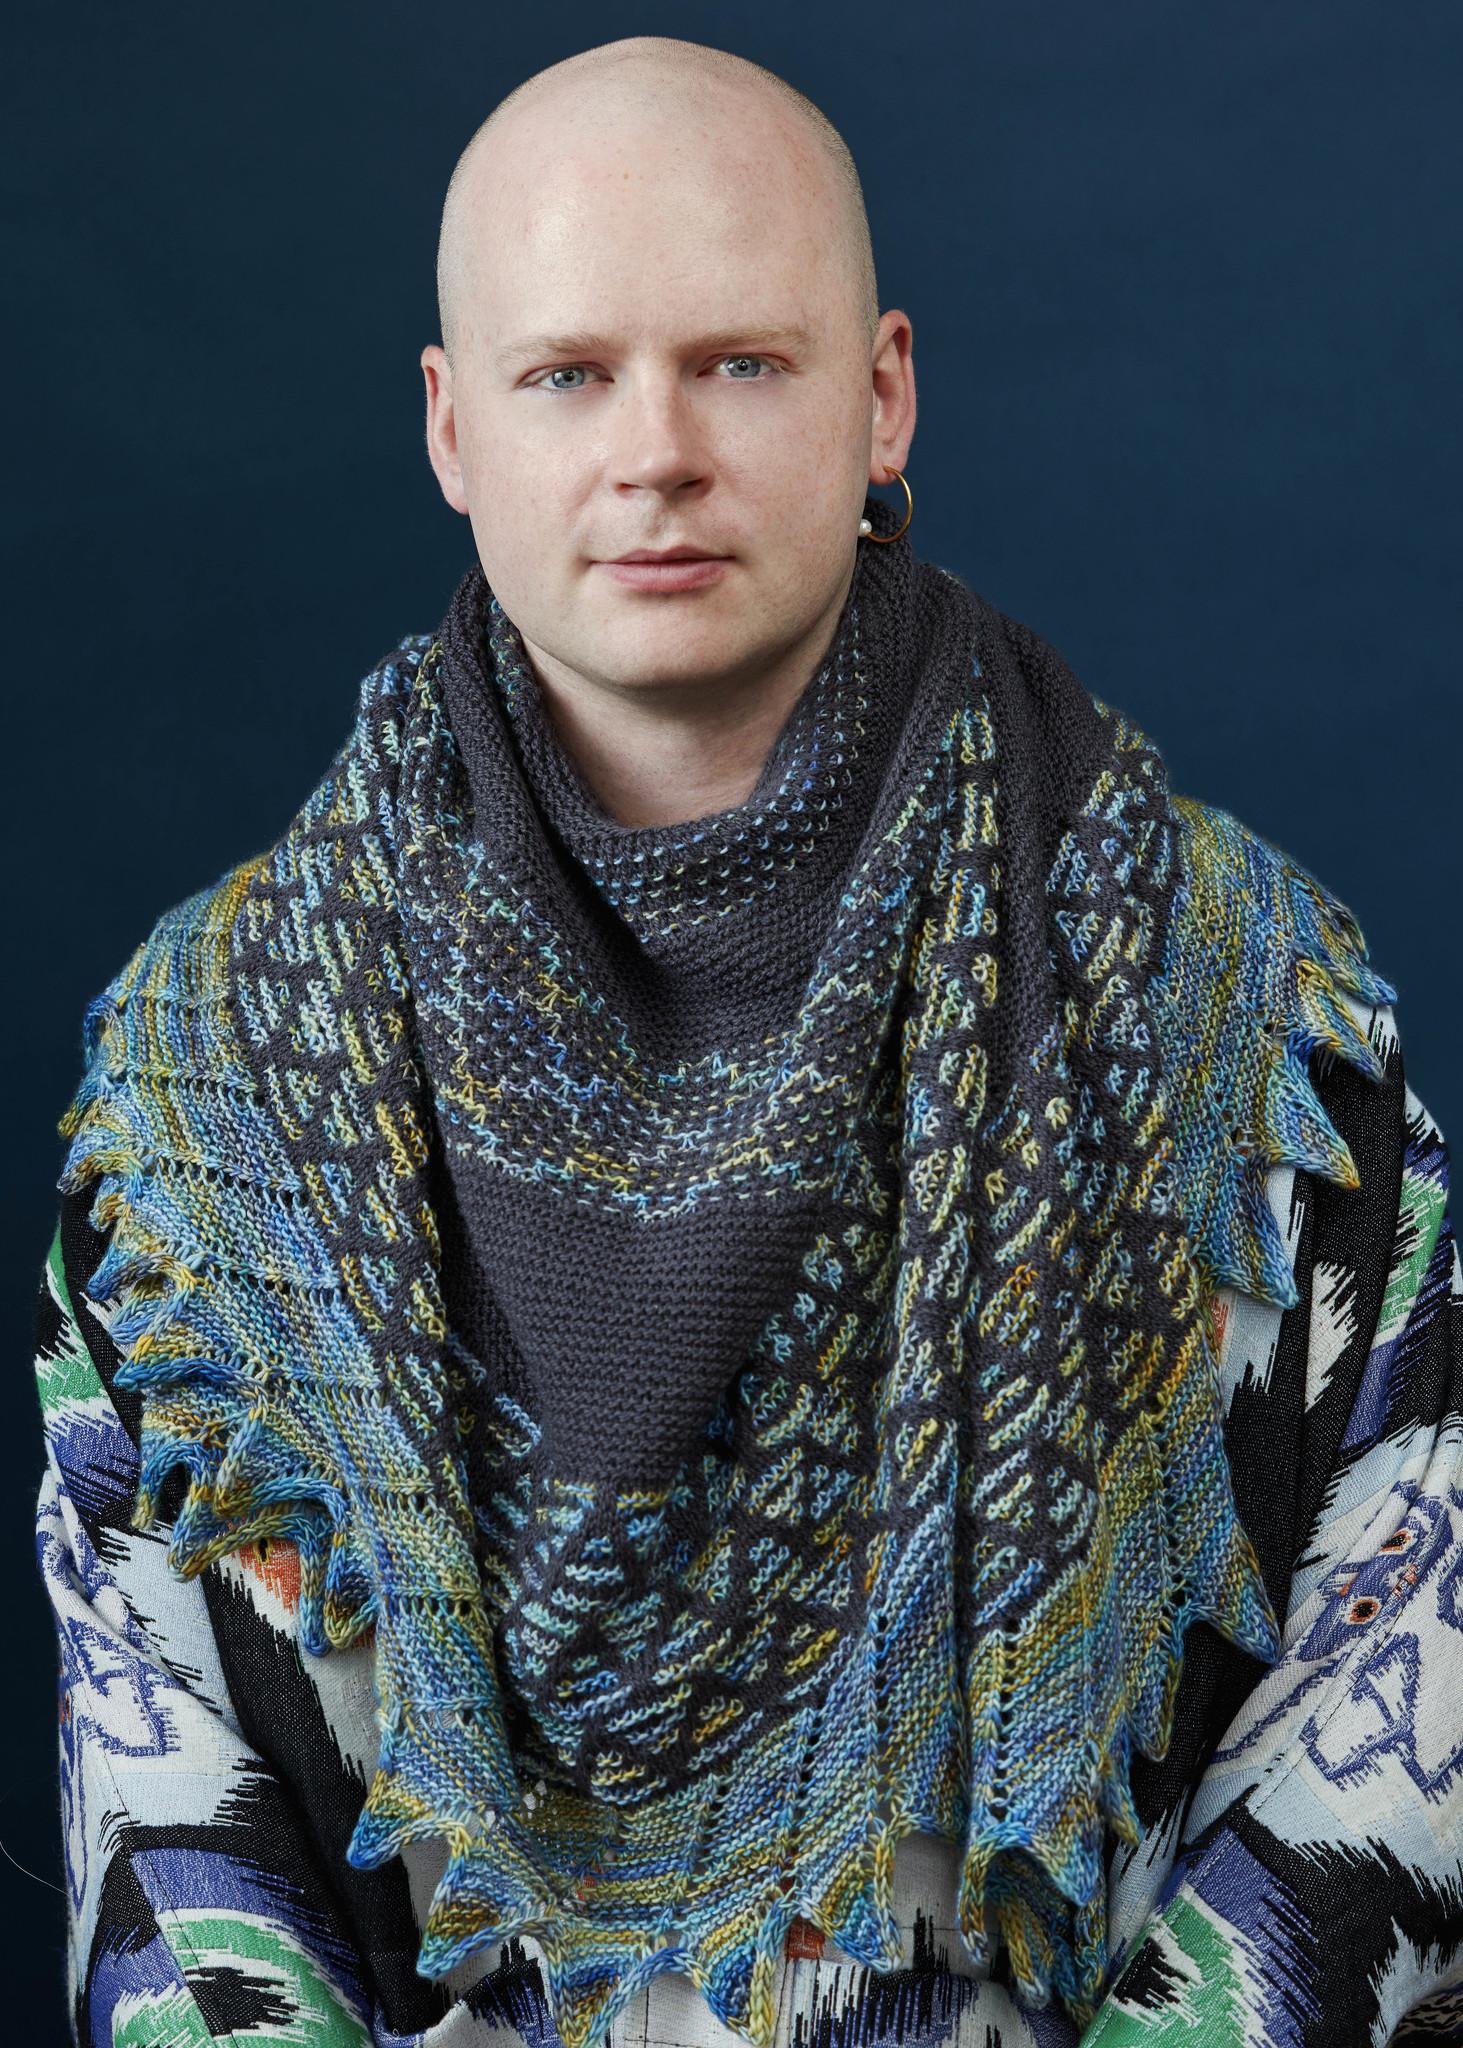 Westknits WESTKNITS KIT MOSAIC MUSINGS - PURPLE 2